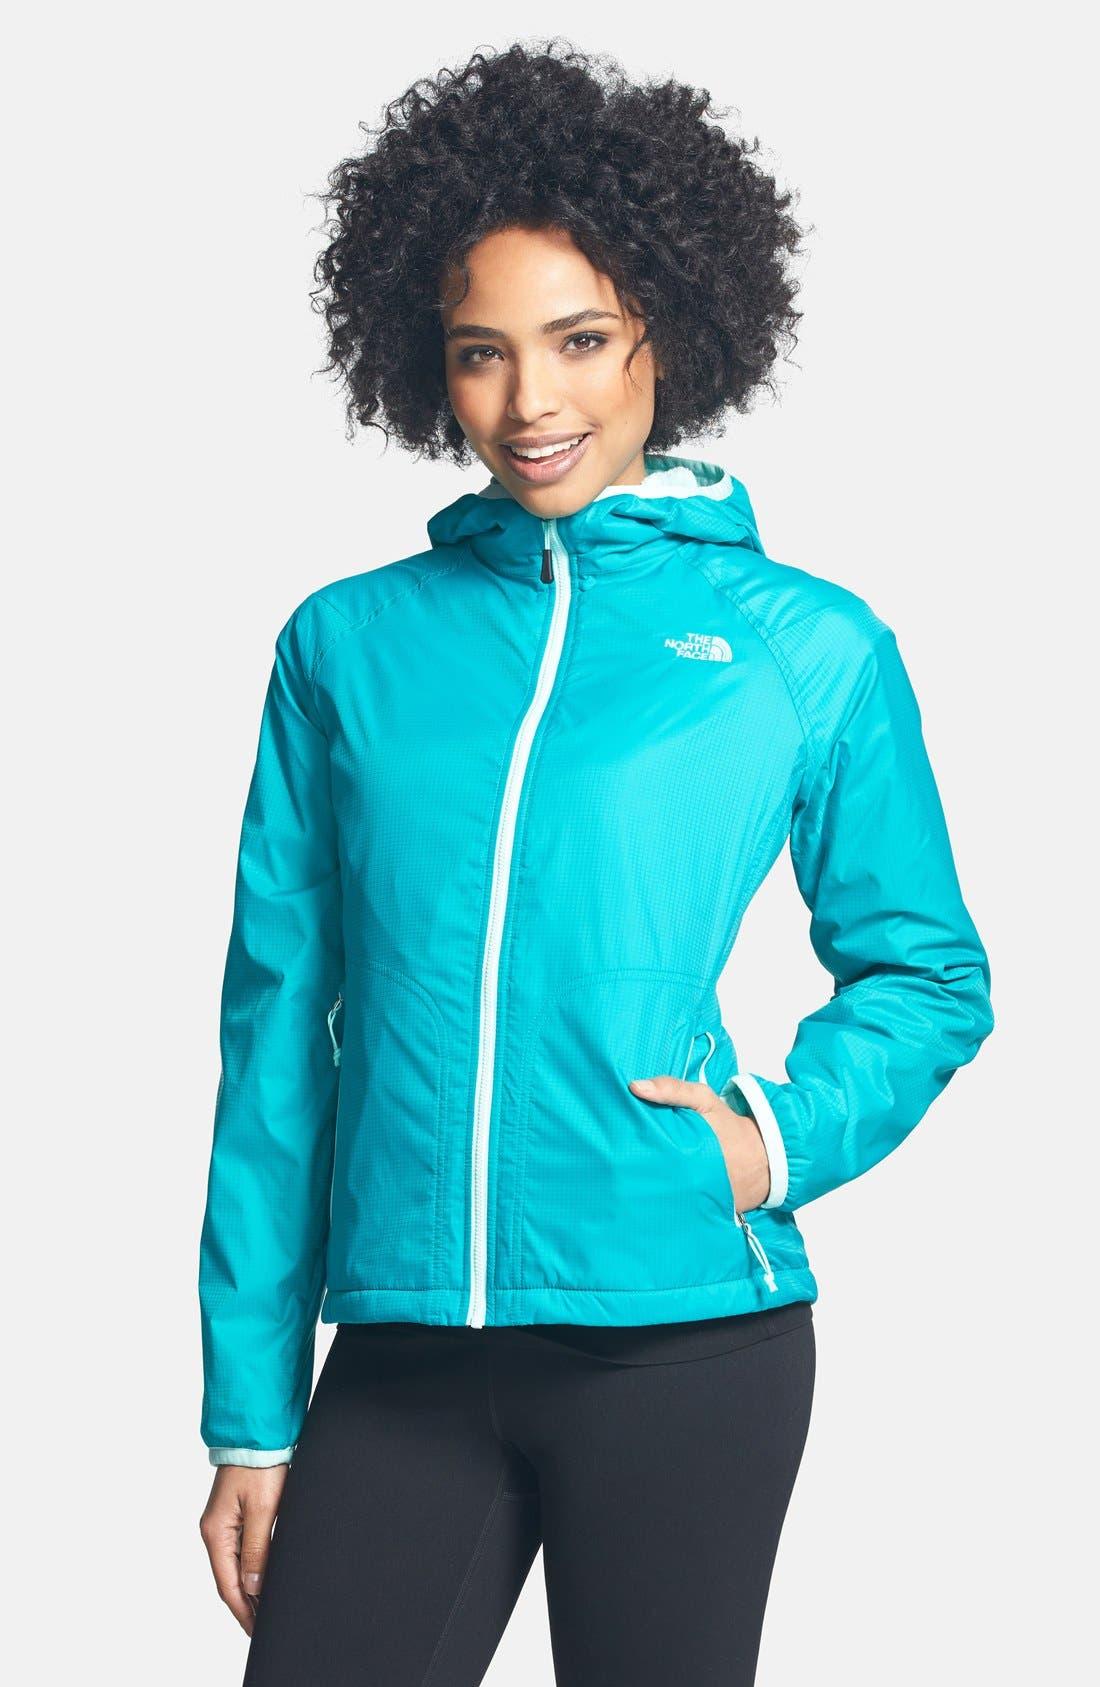 Main Image - The North Face 'Pitaya Swirl' Hooded Jacket